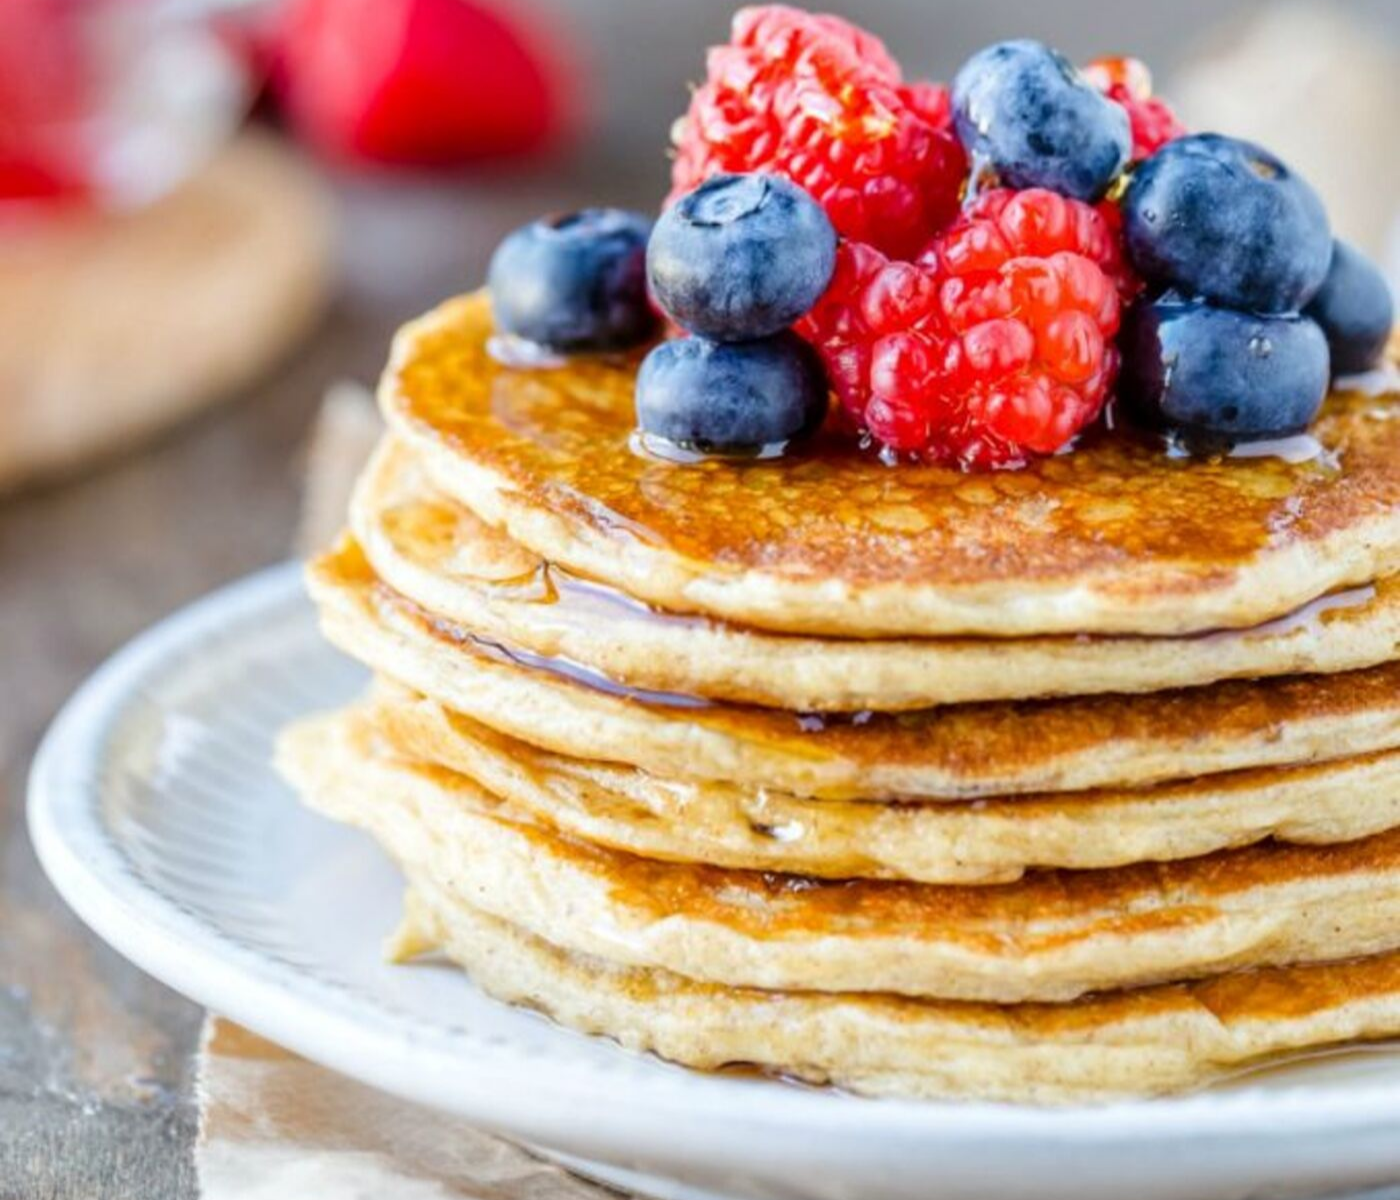 Pancakes bed and breakfast Mayo Wild Atlantic Way